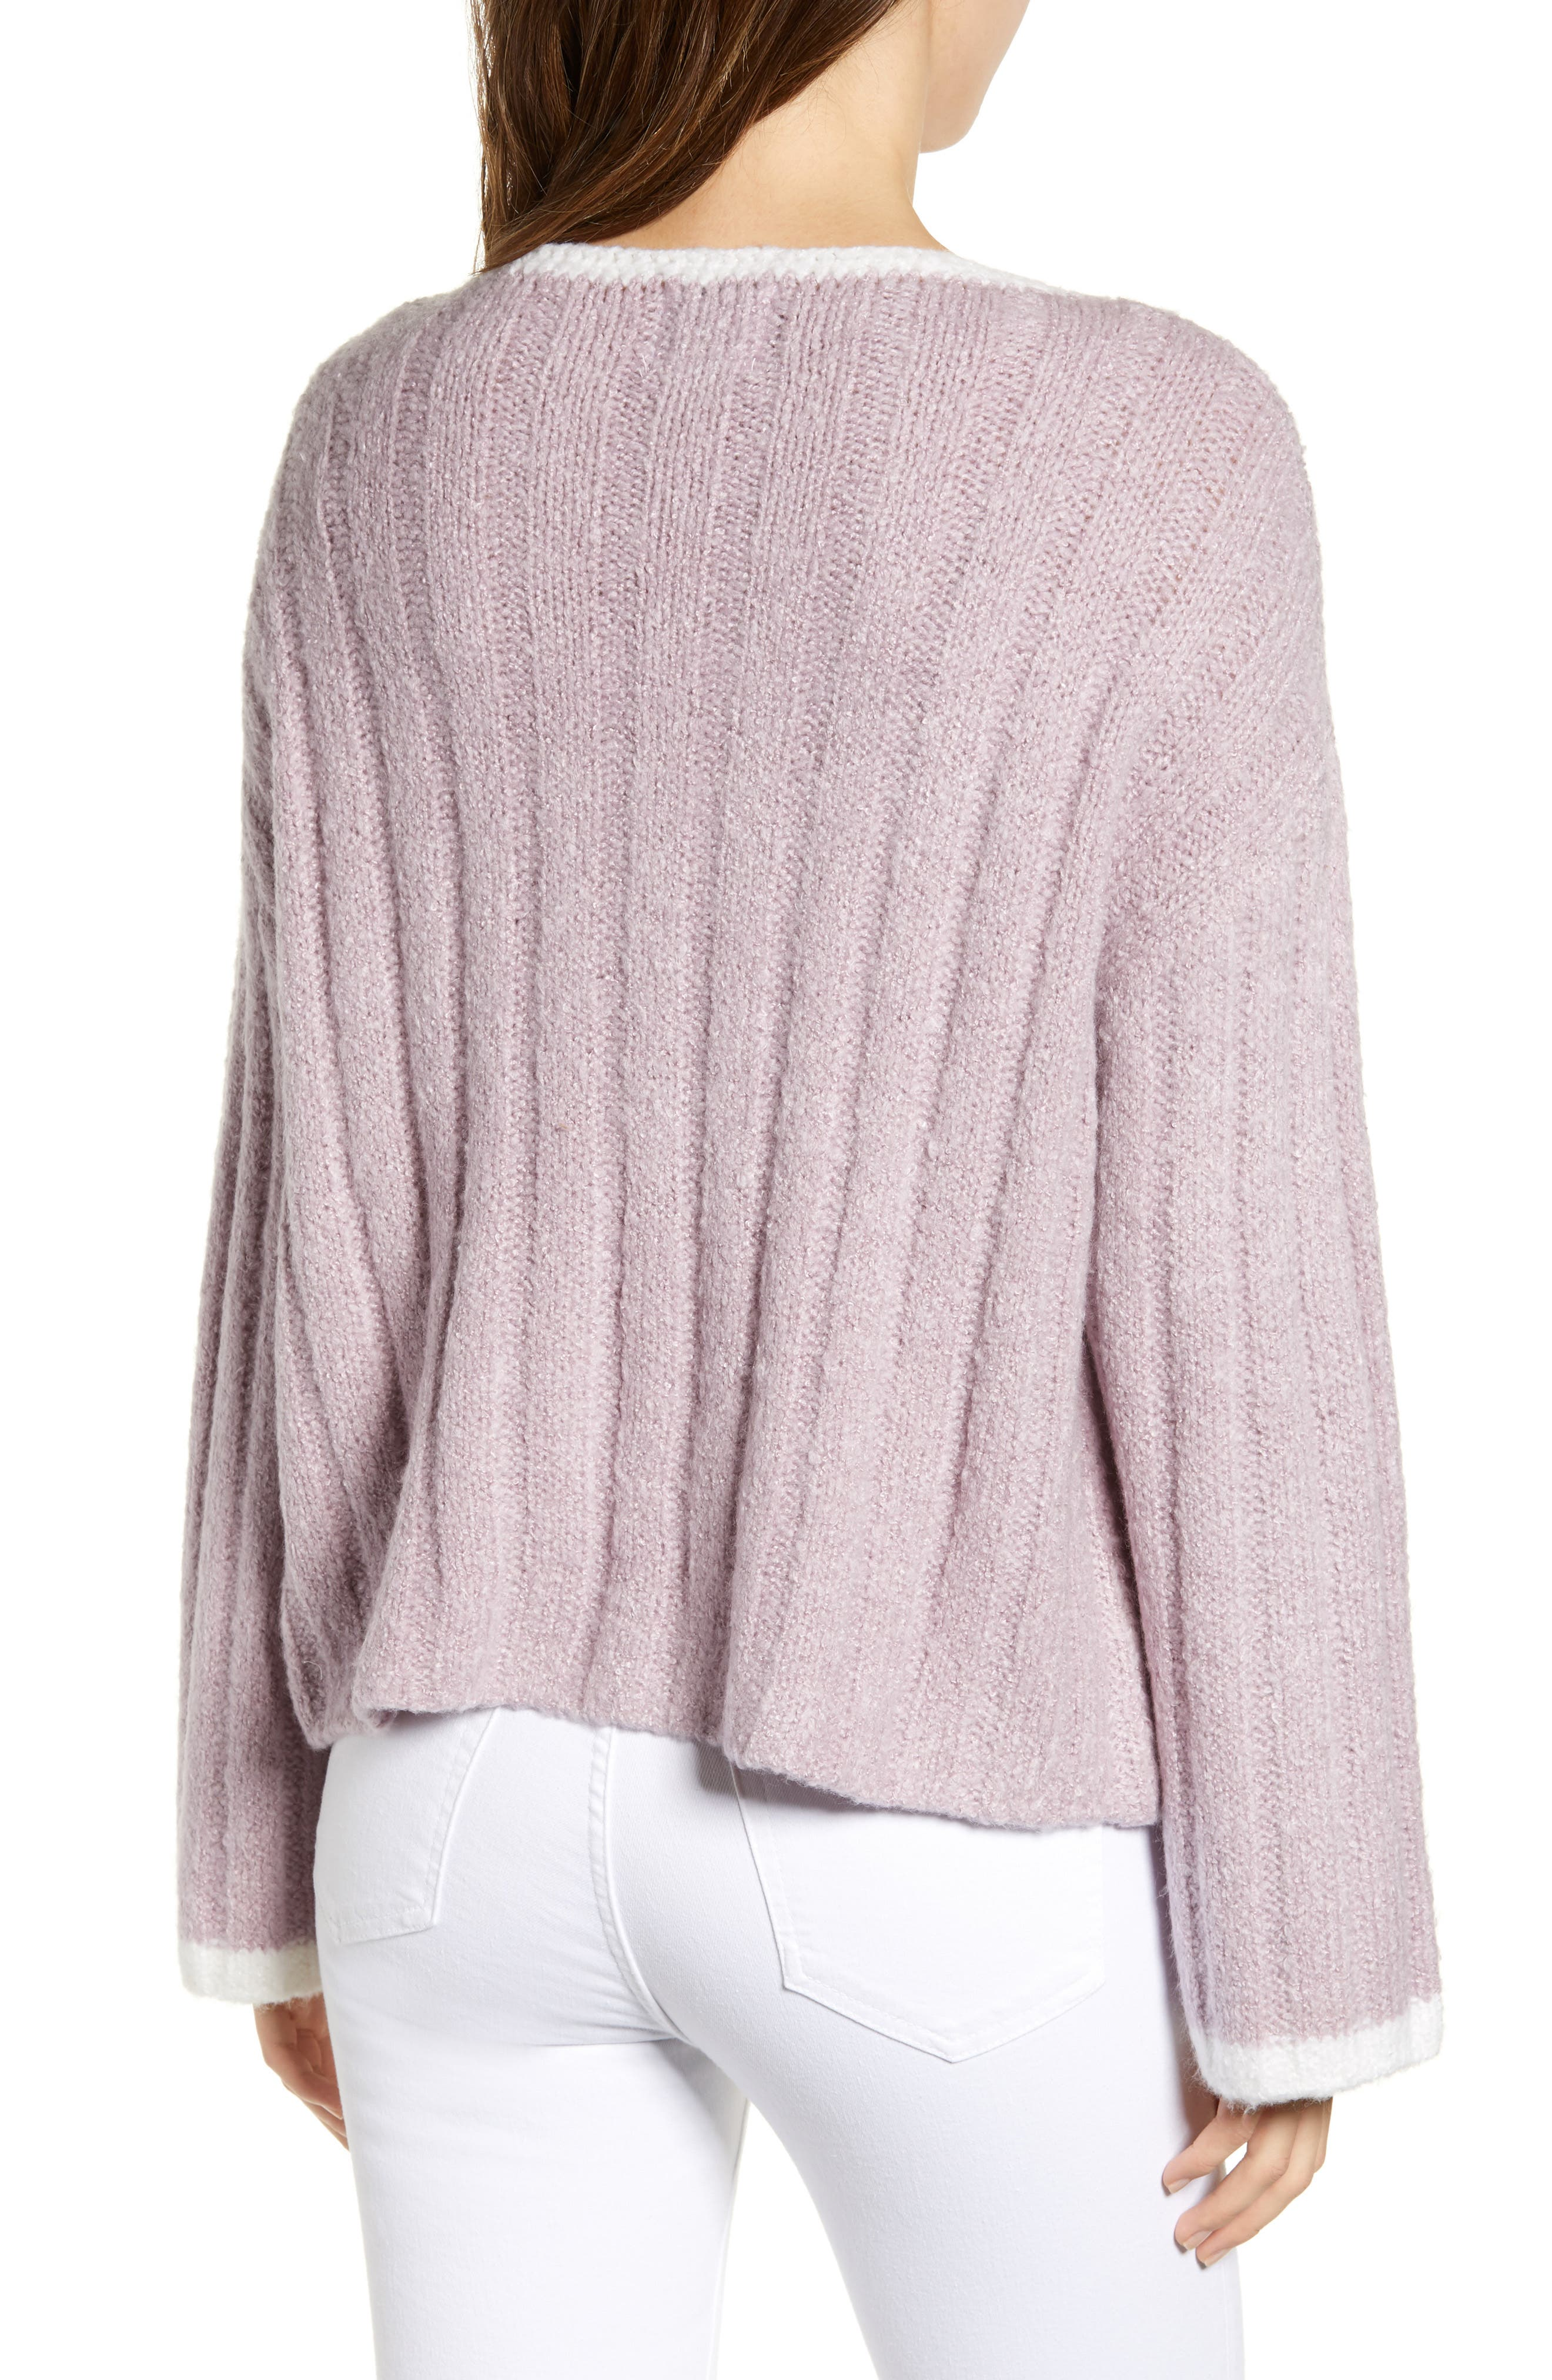 J.O.A., Oversize Sweater, Alternate thumbnail 2, color, LAVENDER